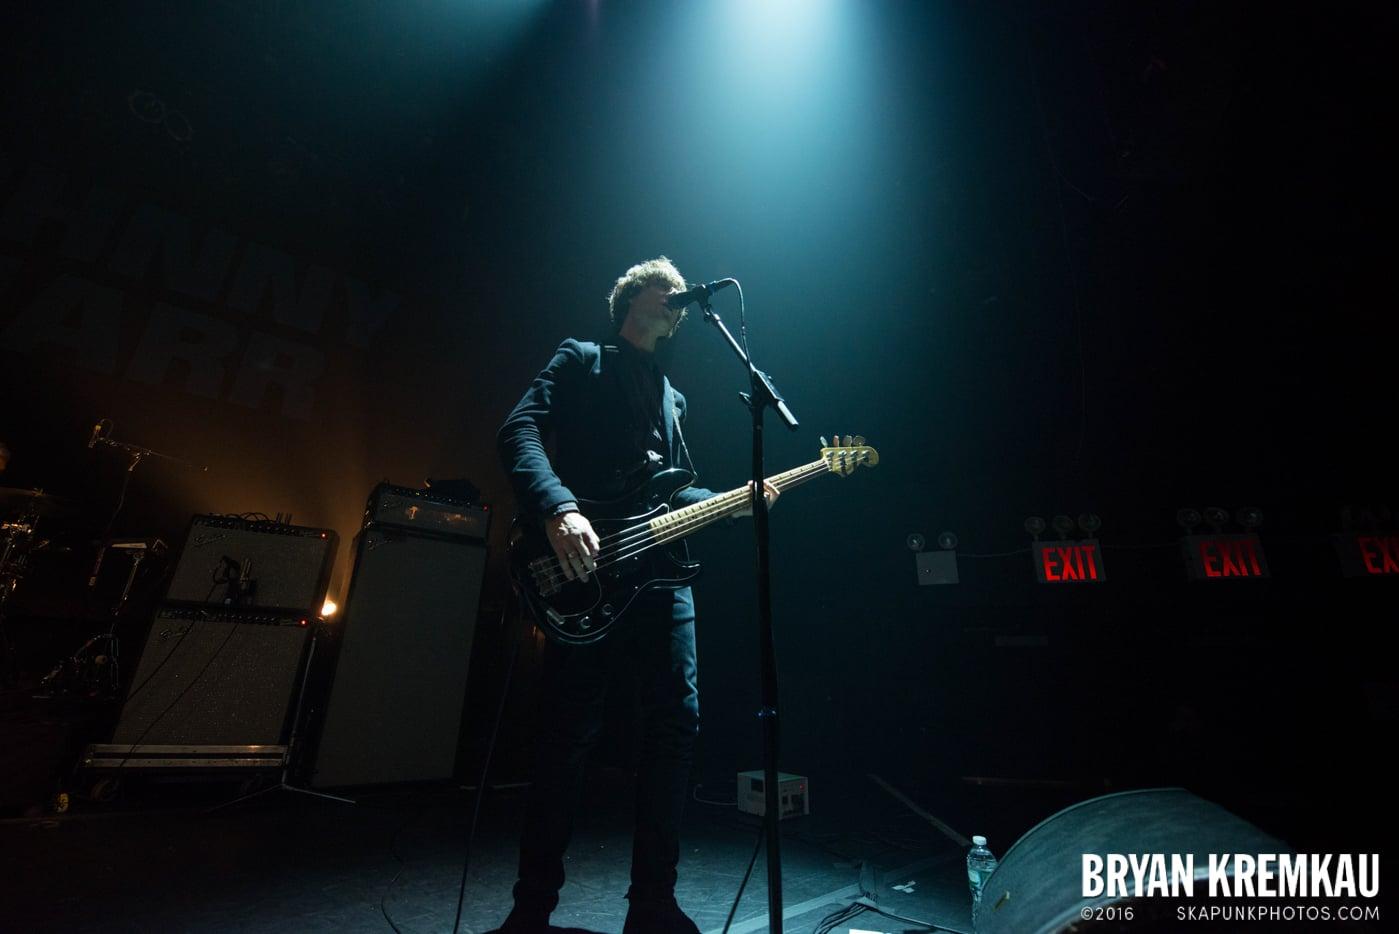 Johnny Marr @ Gramercy Theatre, NYC - 11.12.14 (16)